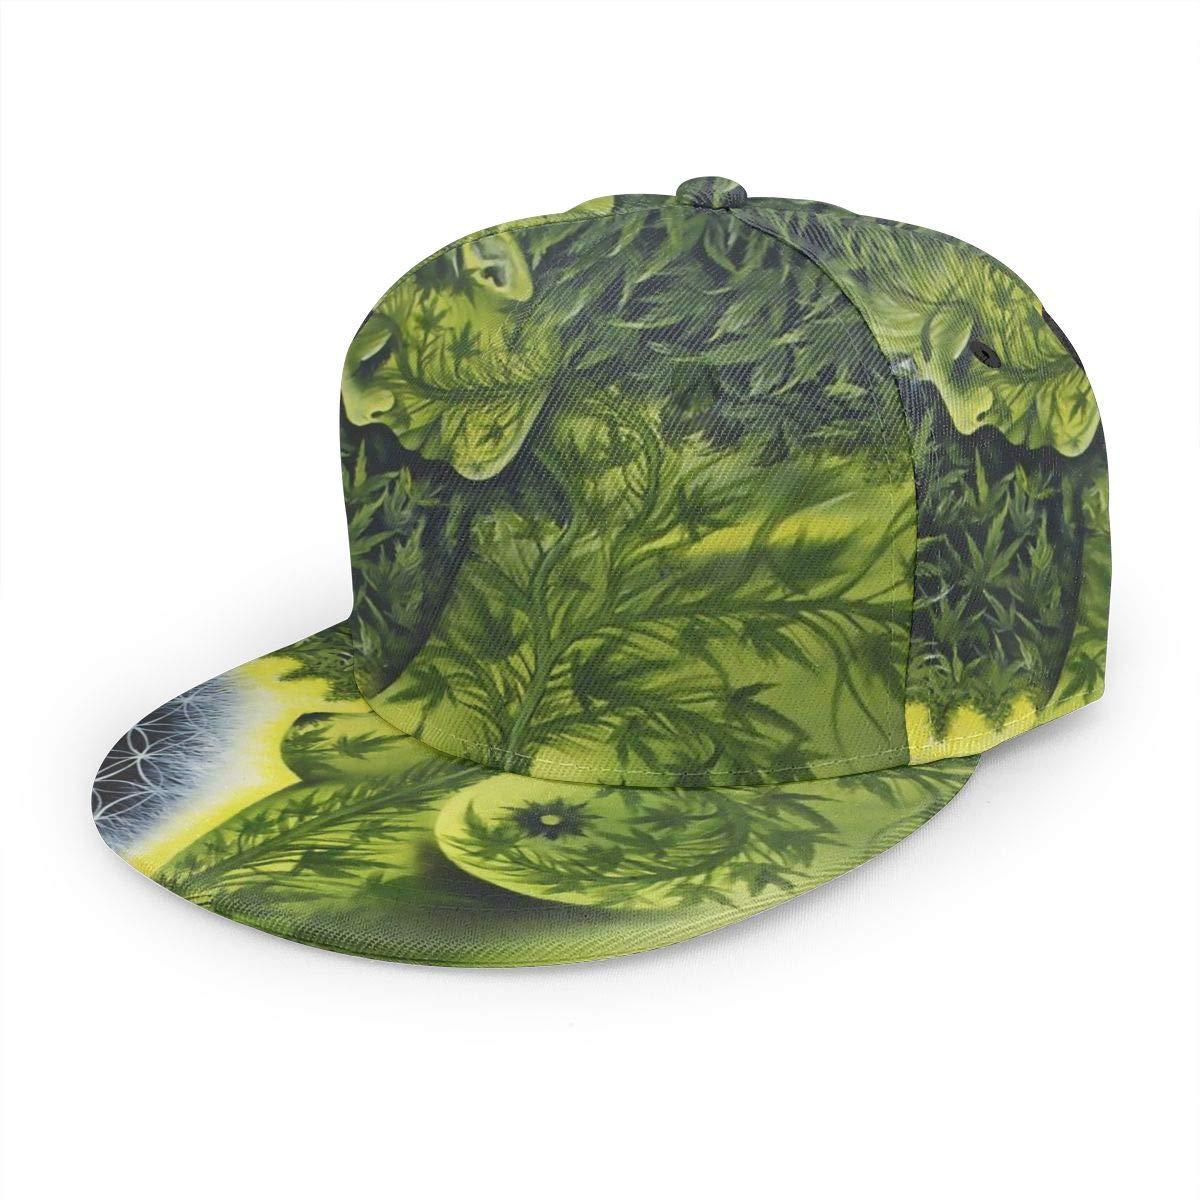 African Woman Weed Leaves Art Girl Fashion Adjustable Flat Brim Baseball Cap Black Accessories Hats Caps